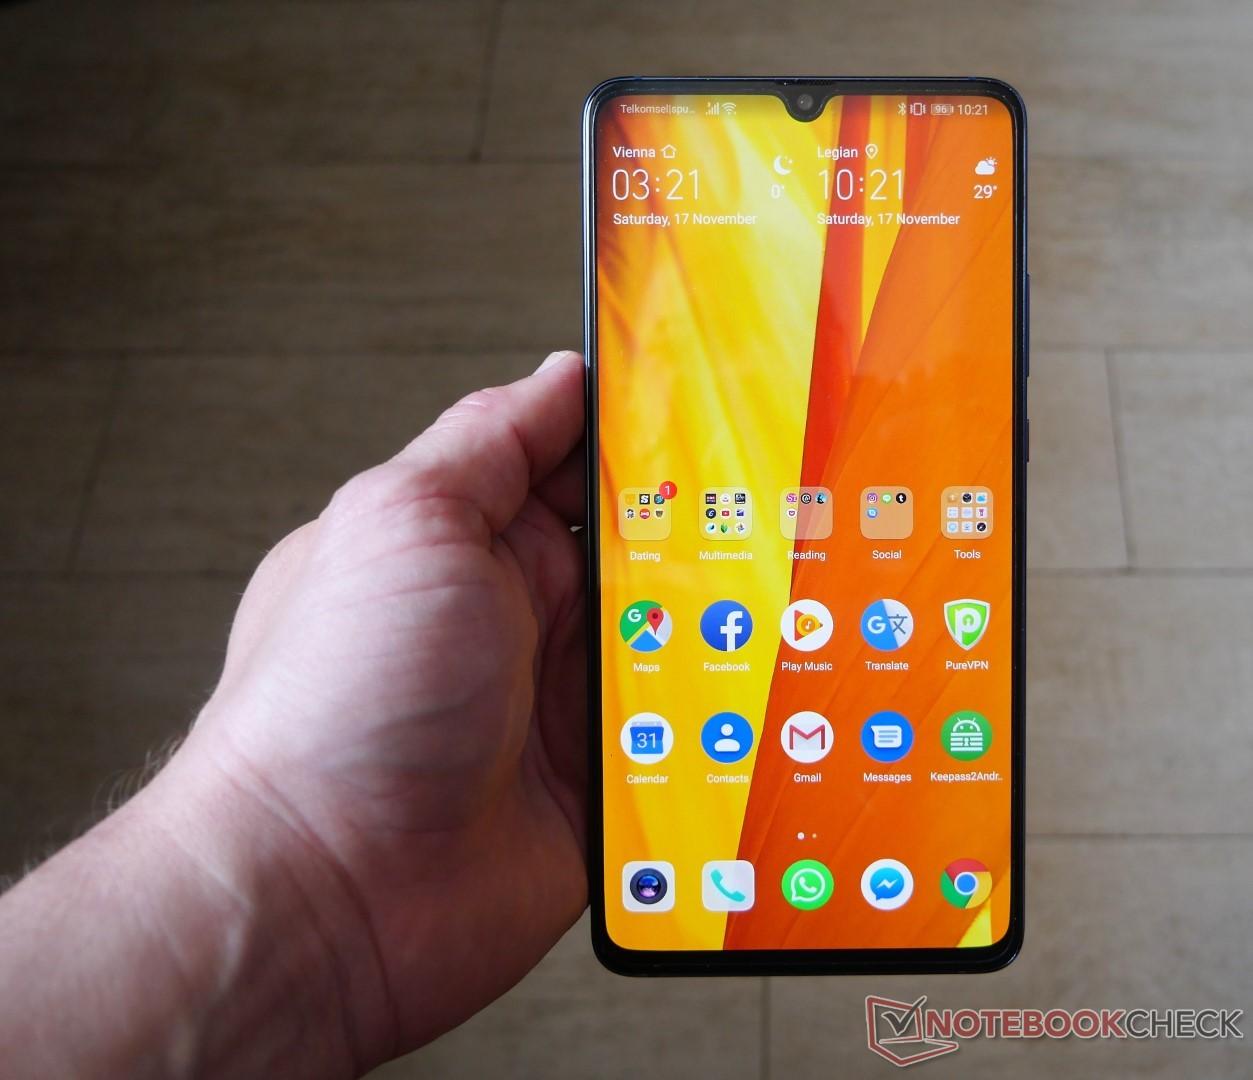 Huawei Mate 20 X Hands On Und Erfahrungsbericht Zum Riesenhandy Mit Pen Support Notebookcheck Com News